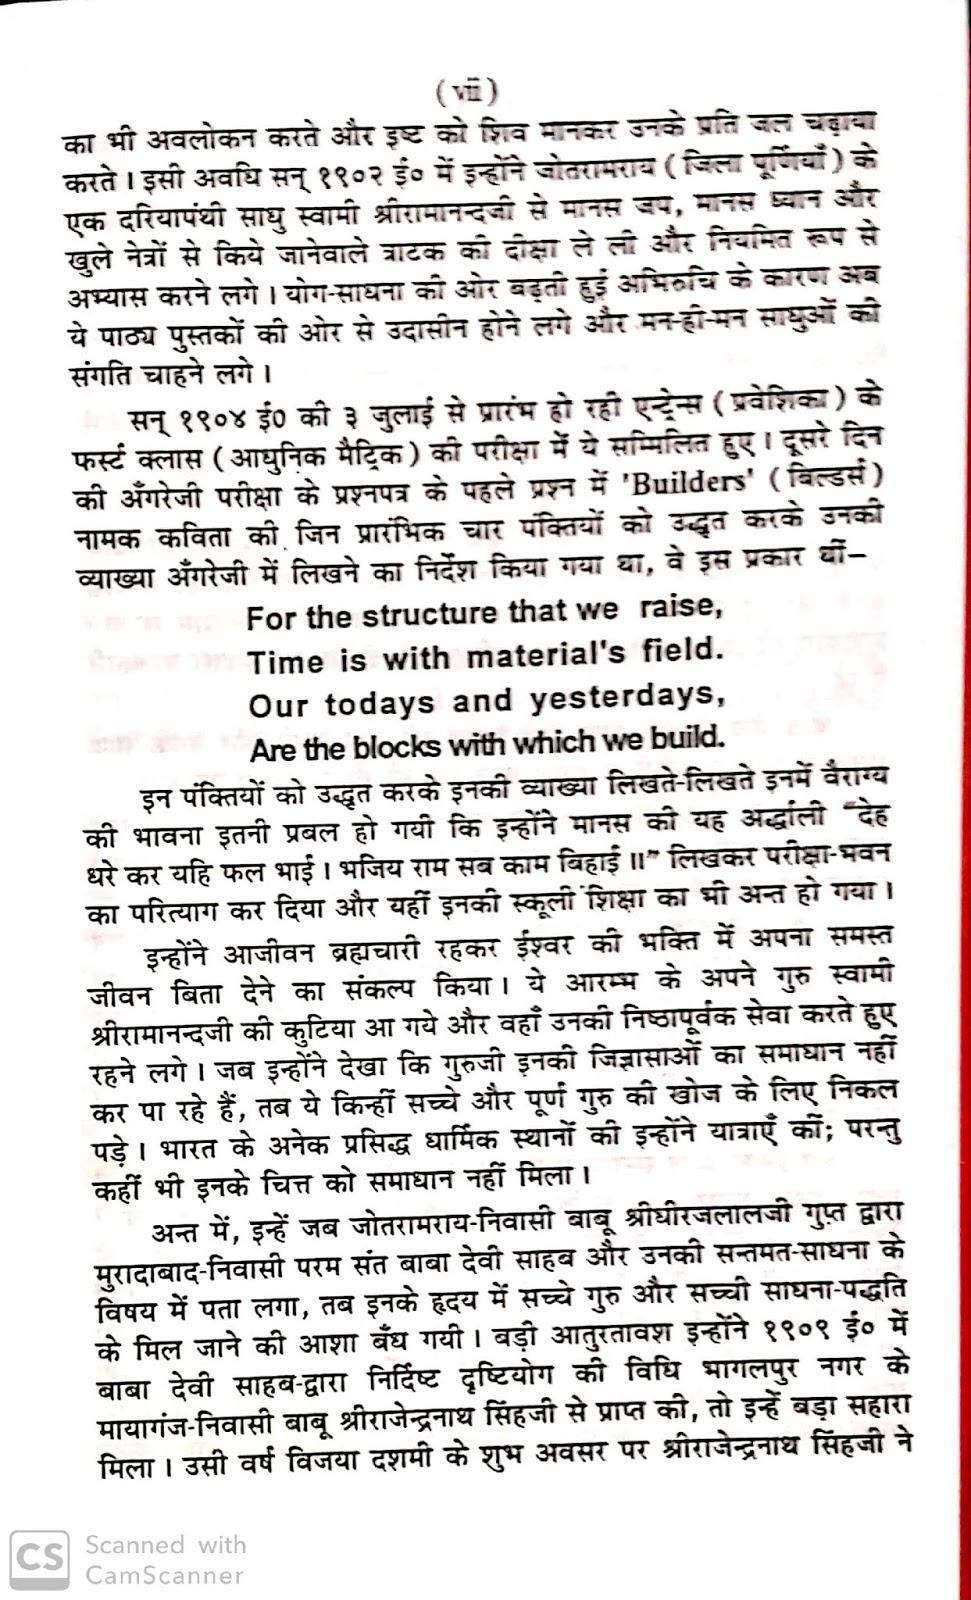 सद्गुरु महर्षि मेंहीं परमहंस जी महाराज एक परिचय Paramahansa ji is an introduction to Sadguru Maharshi। महर्षि मेंहीं परिचय चित्र दो